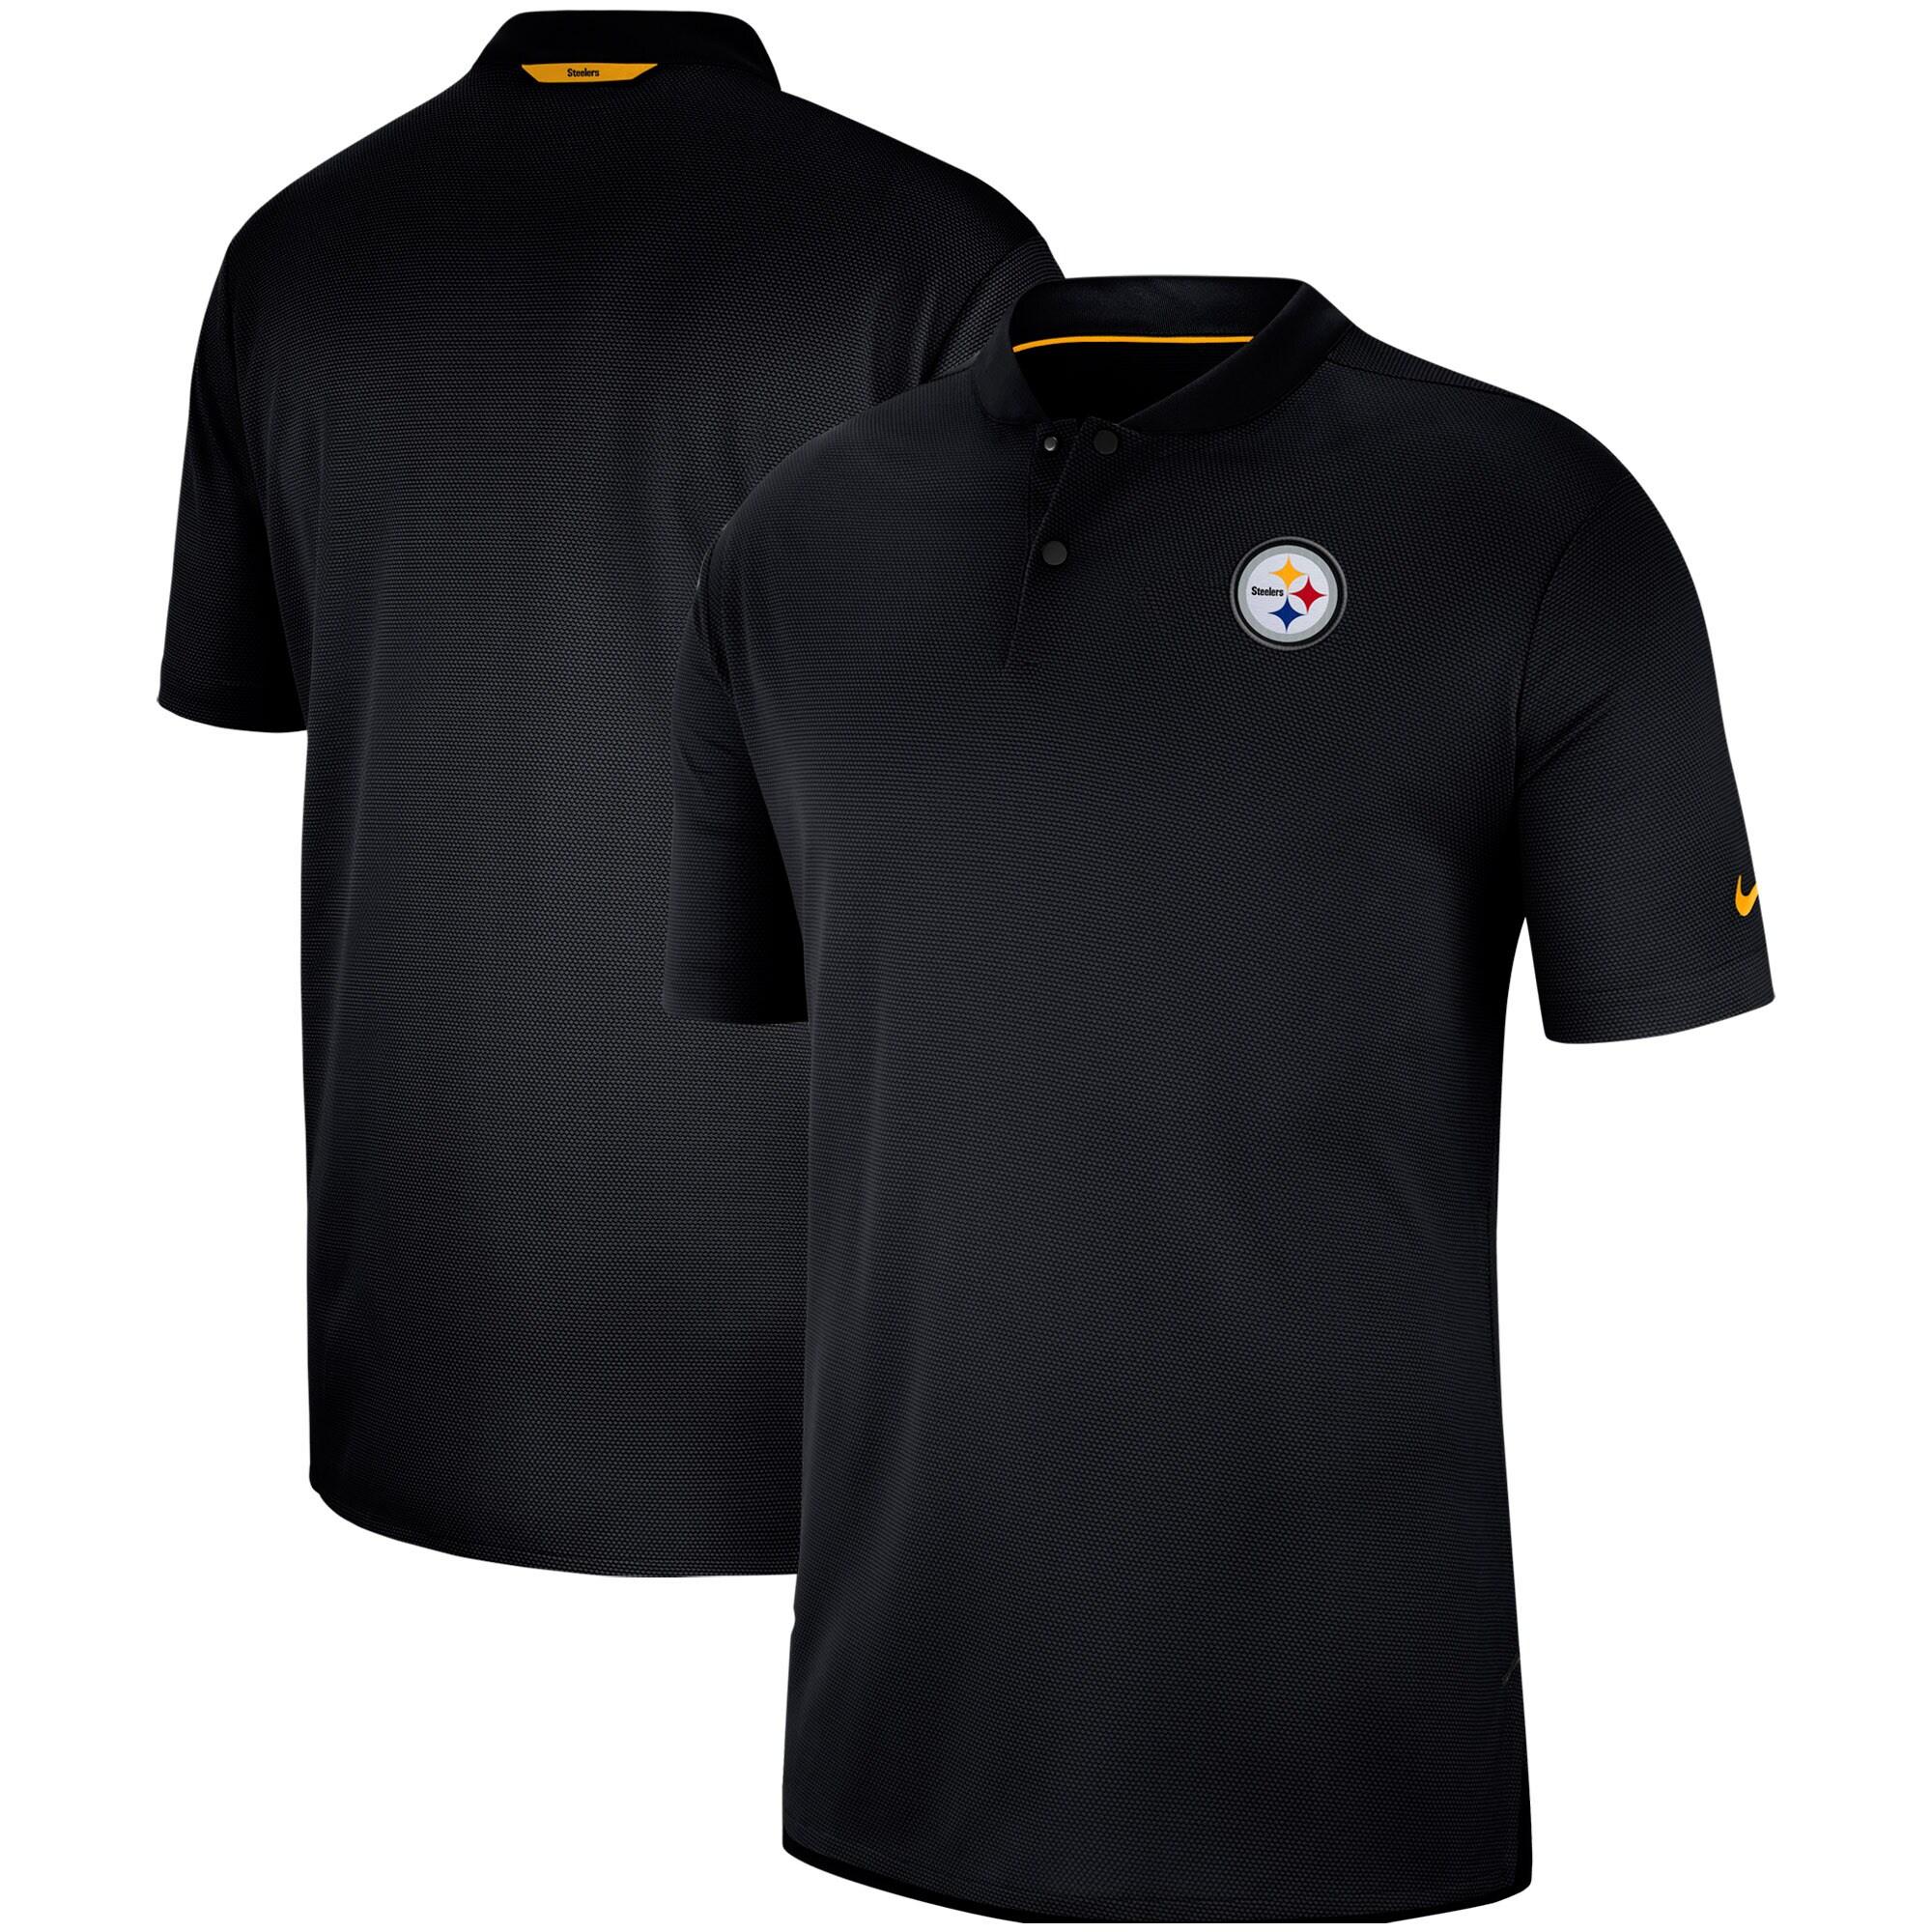 Pittsburgh Steelers Nike Sideline Elite Coaches Performance Polo - Black